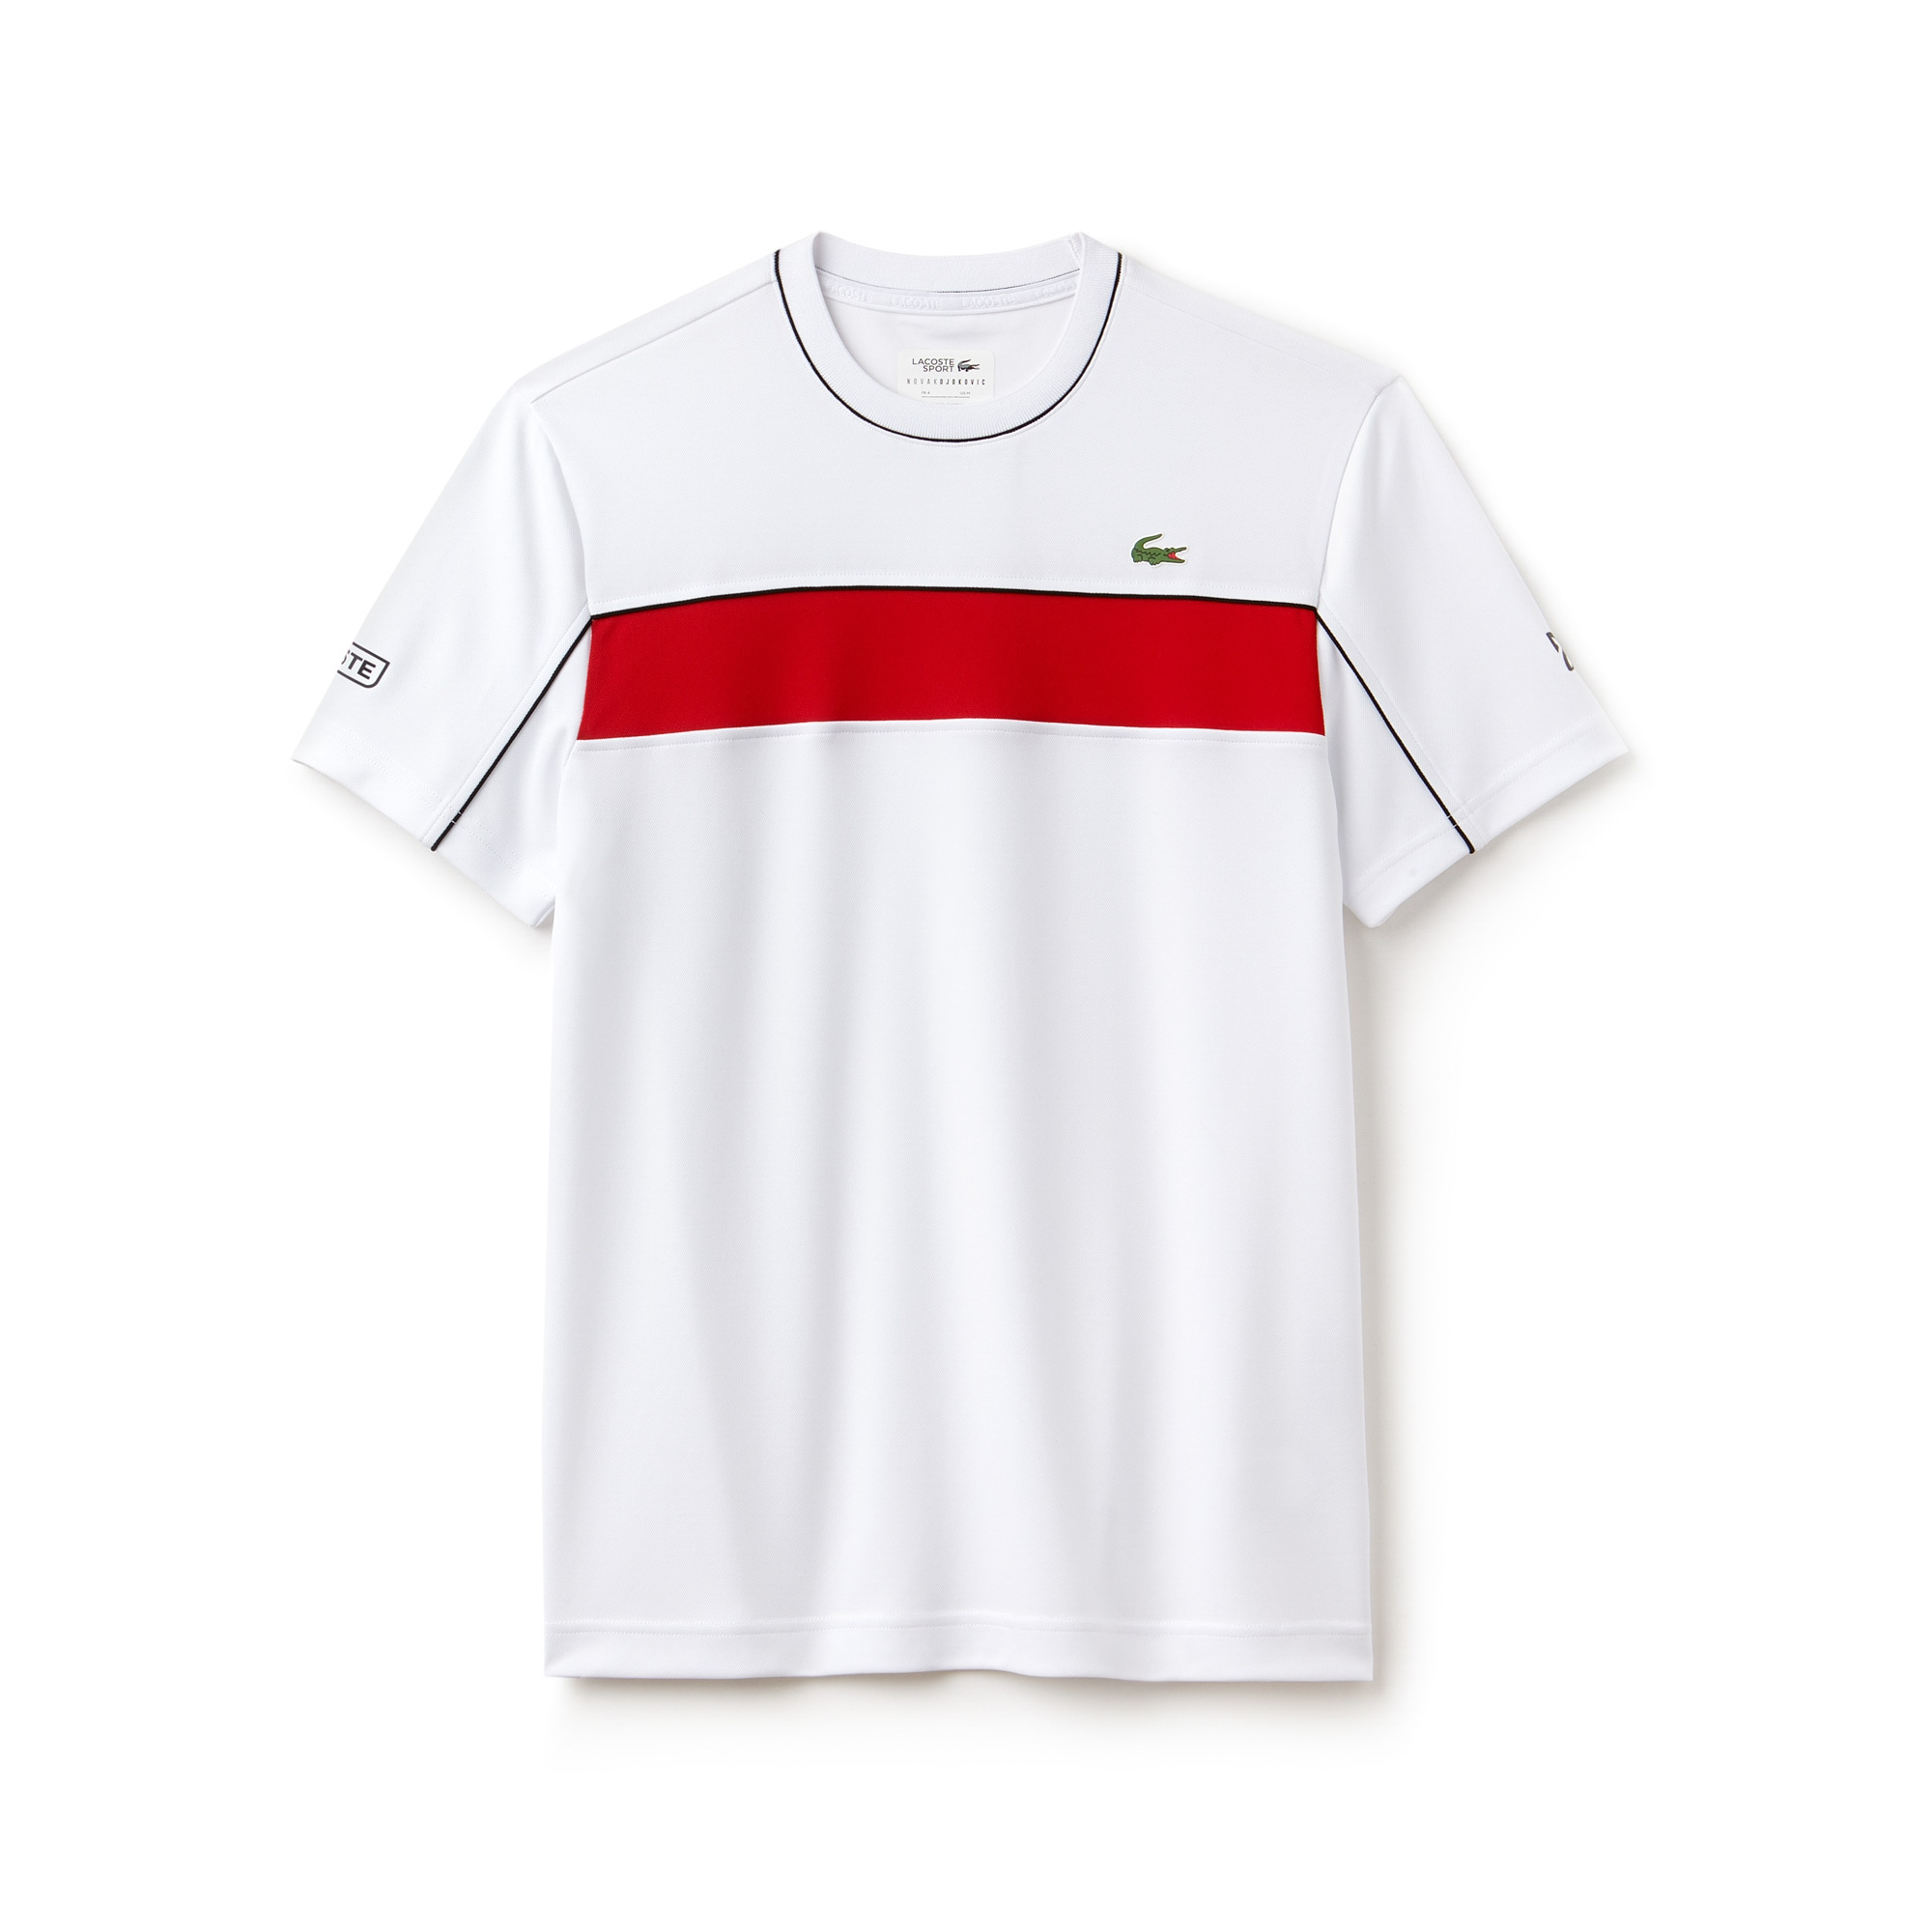 Men's LACOSTE SPORT NOVAK DJOKOVIC COLLECTION Colorblock Tech Piqué T-shirt